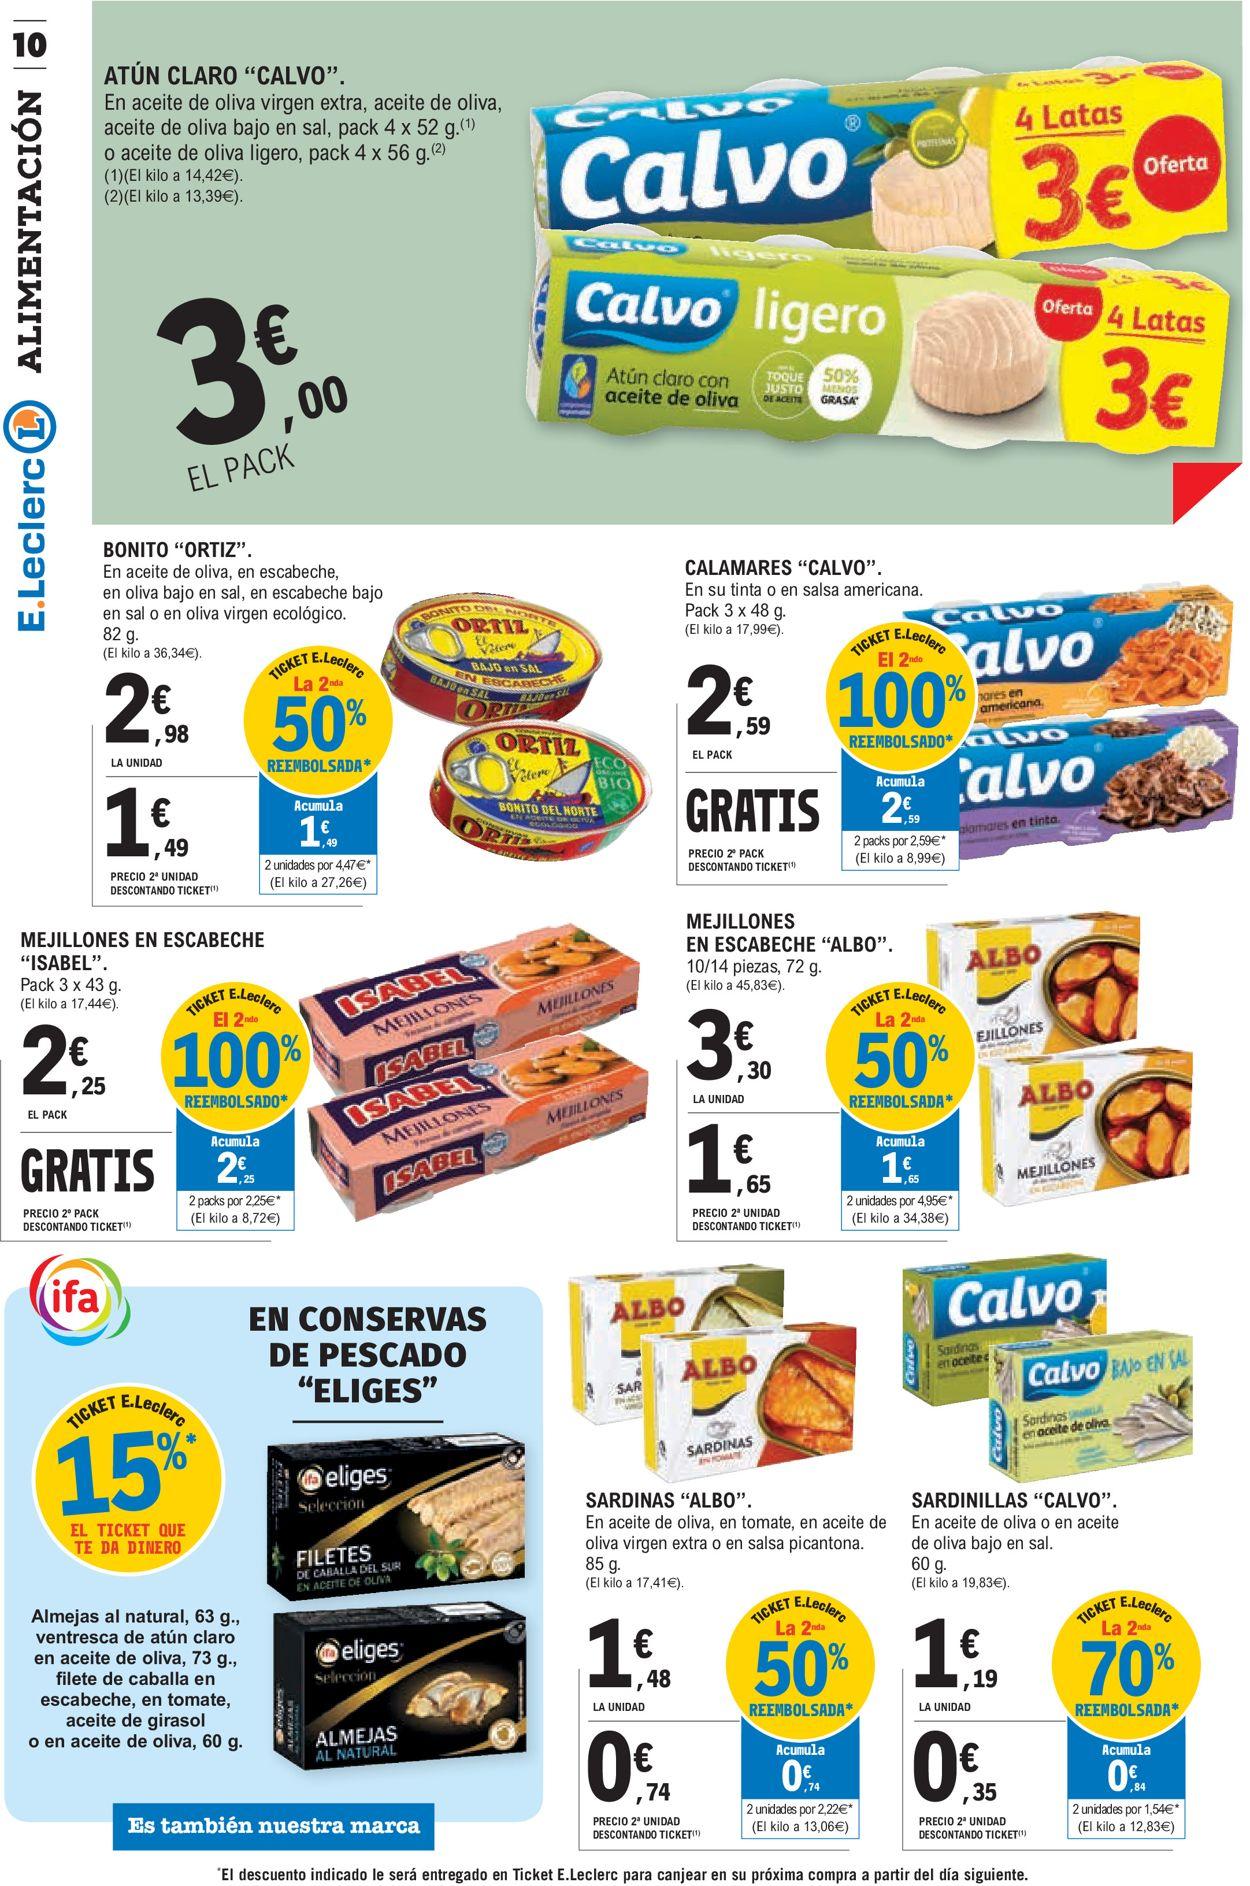 E.leclerc Folleto - 10.06-21.06.2020 (Página 10)